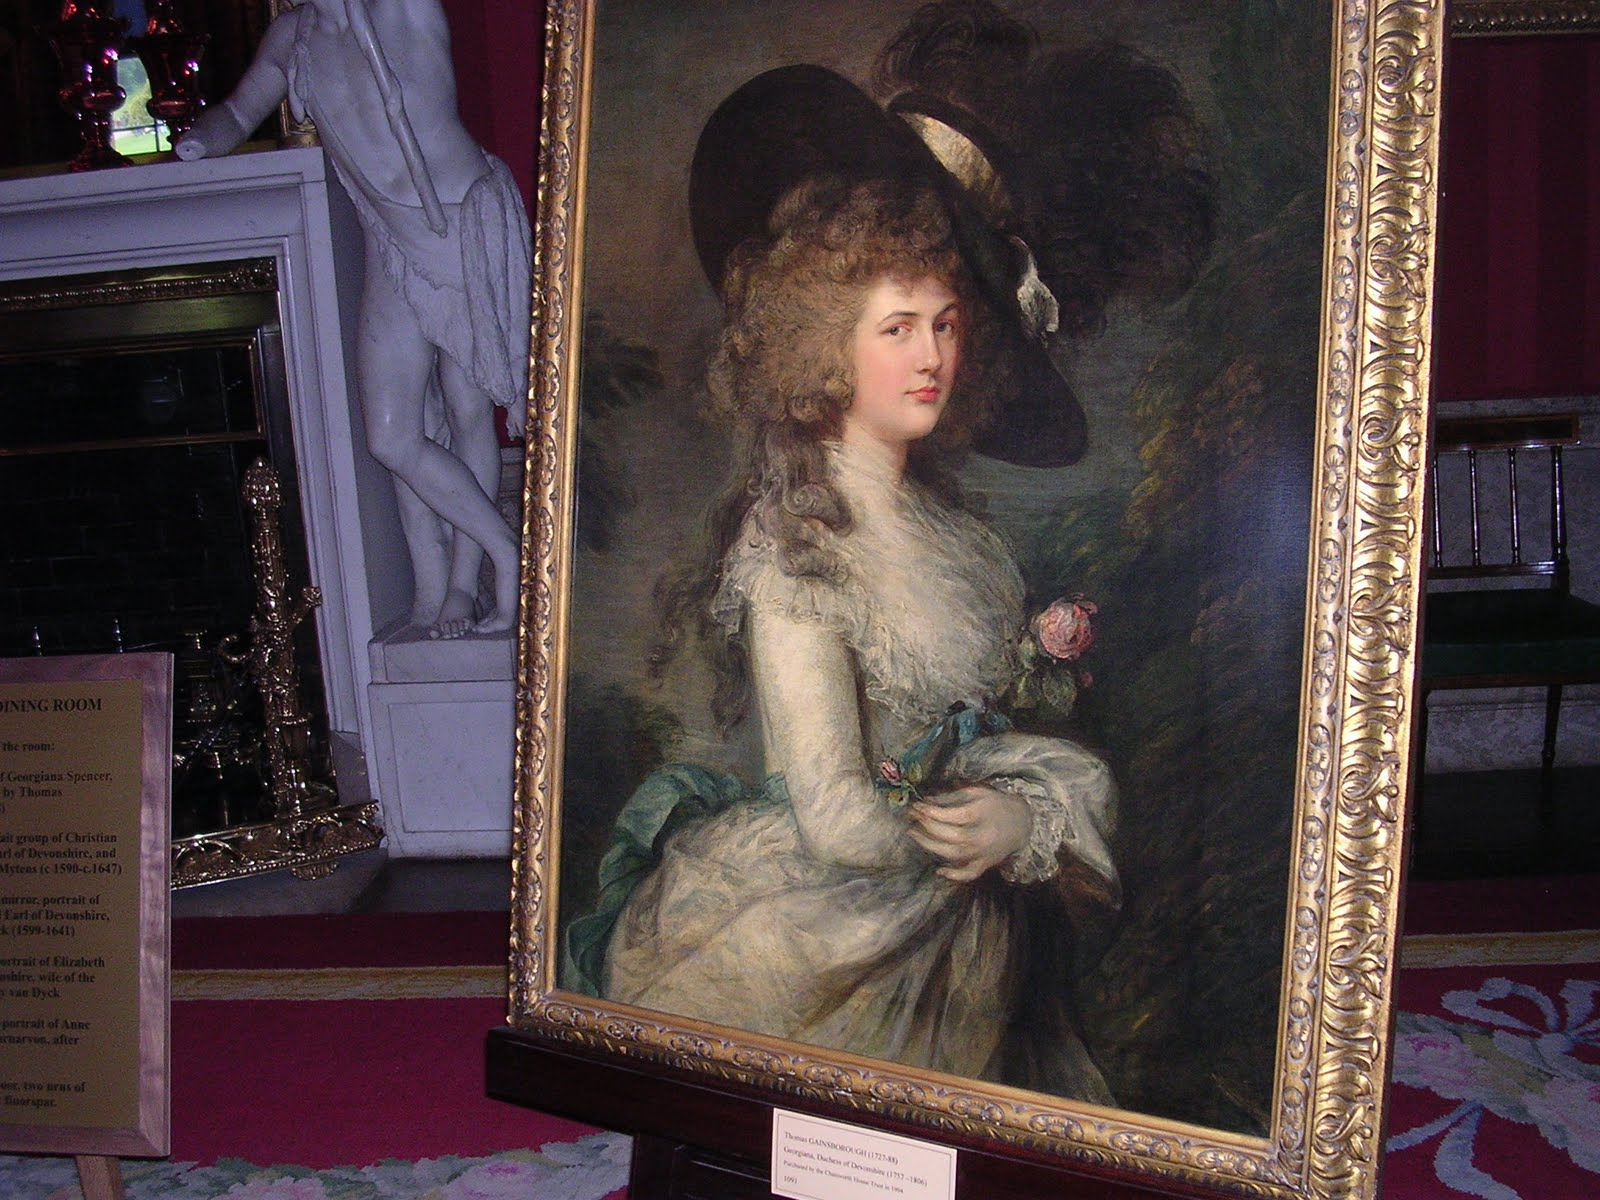 Duchess of Devonshire Stolen! – Number One London